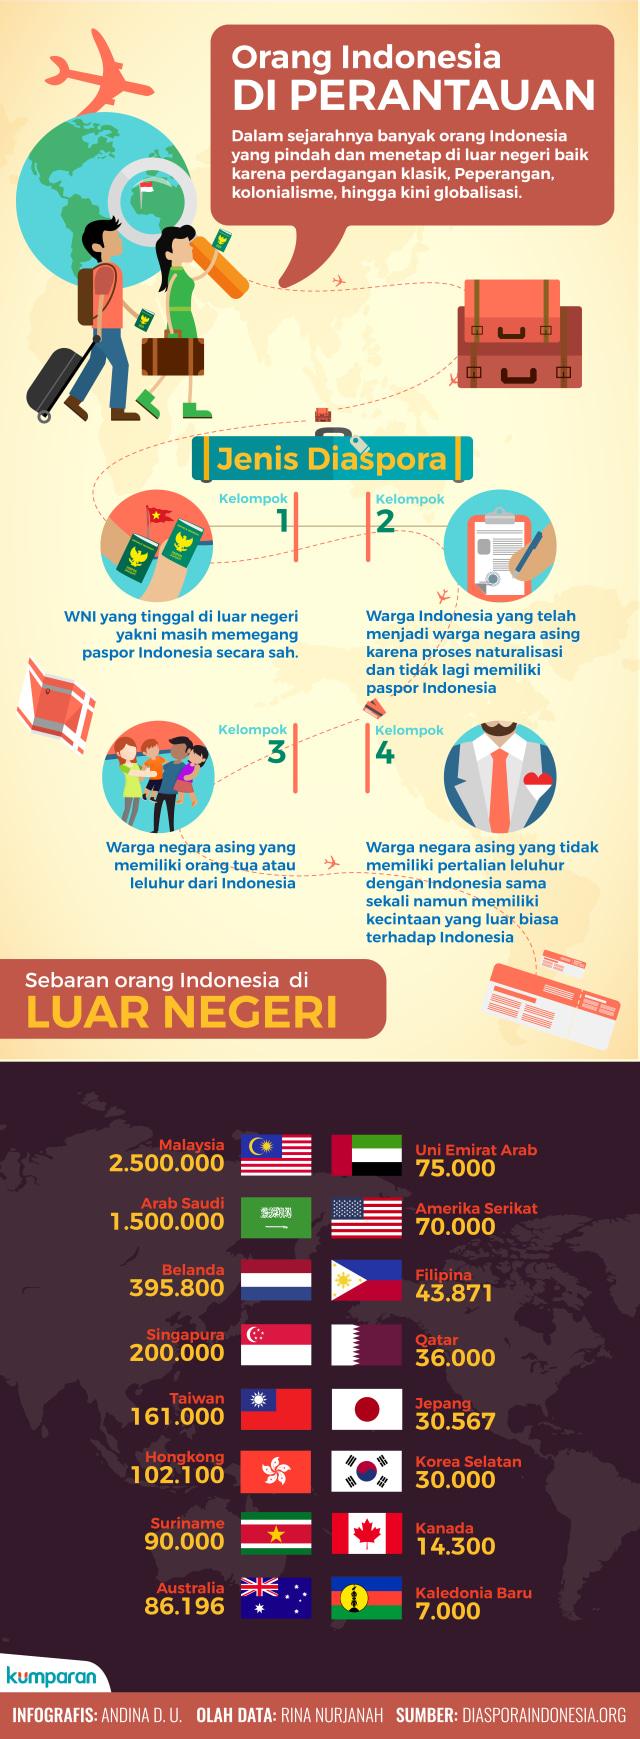 Cerita Diaspora: Orang Indonesia di Perantauan (709756)